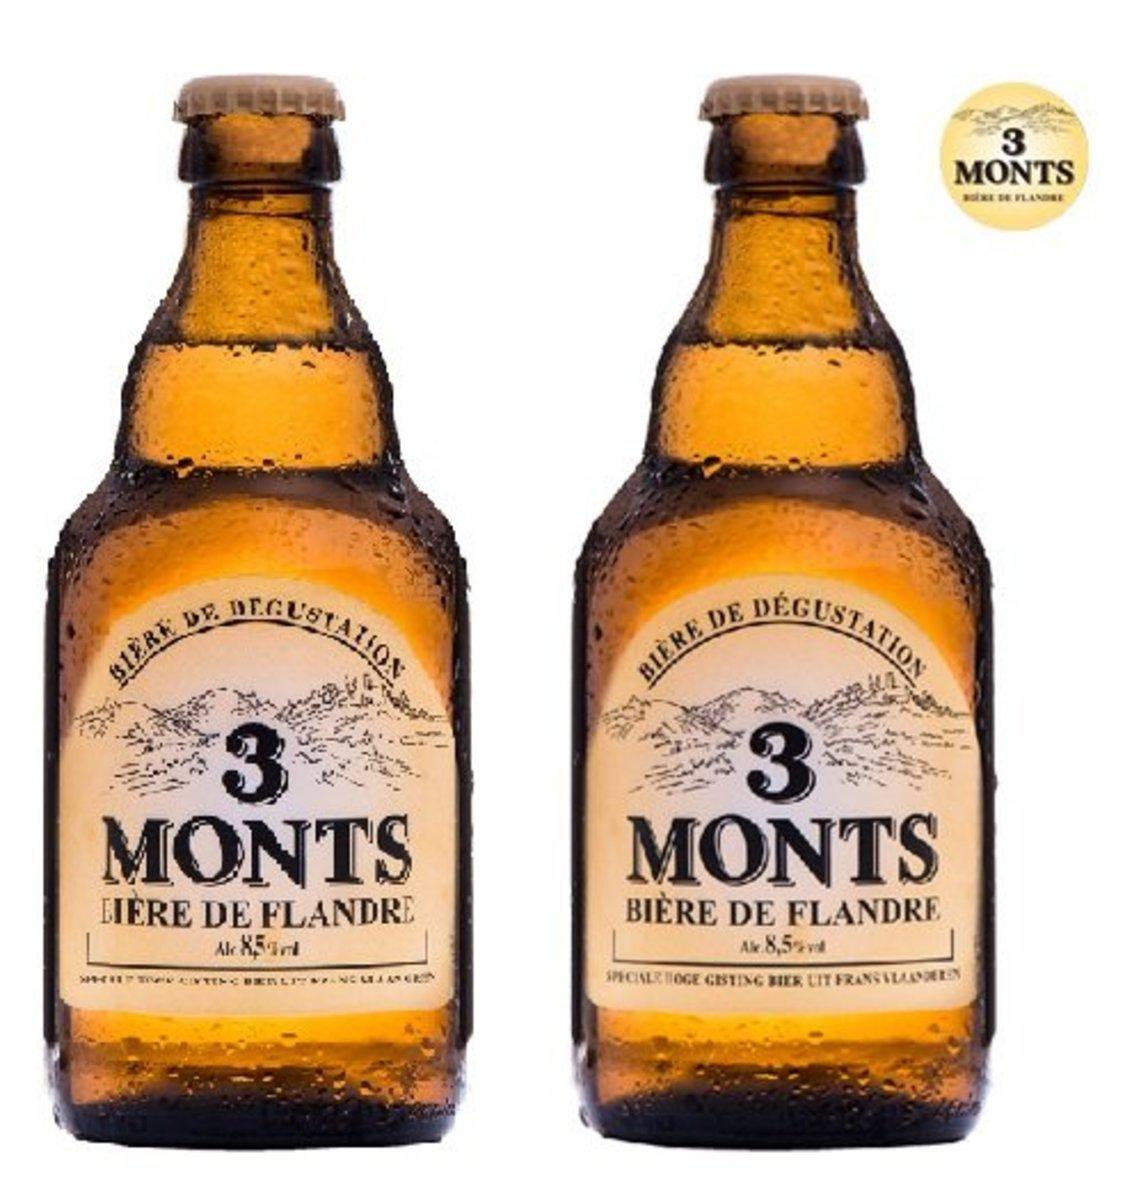 3 MONTS [法國制造手工啤] 原味麥啤- 330mL [2支套裝]